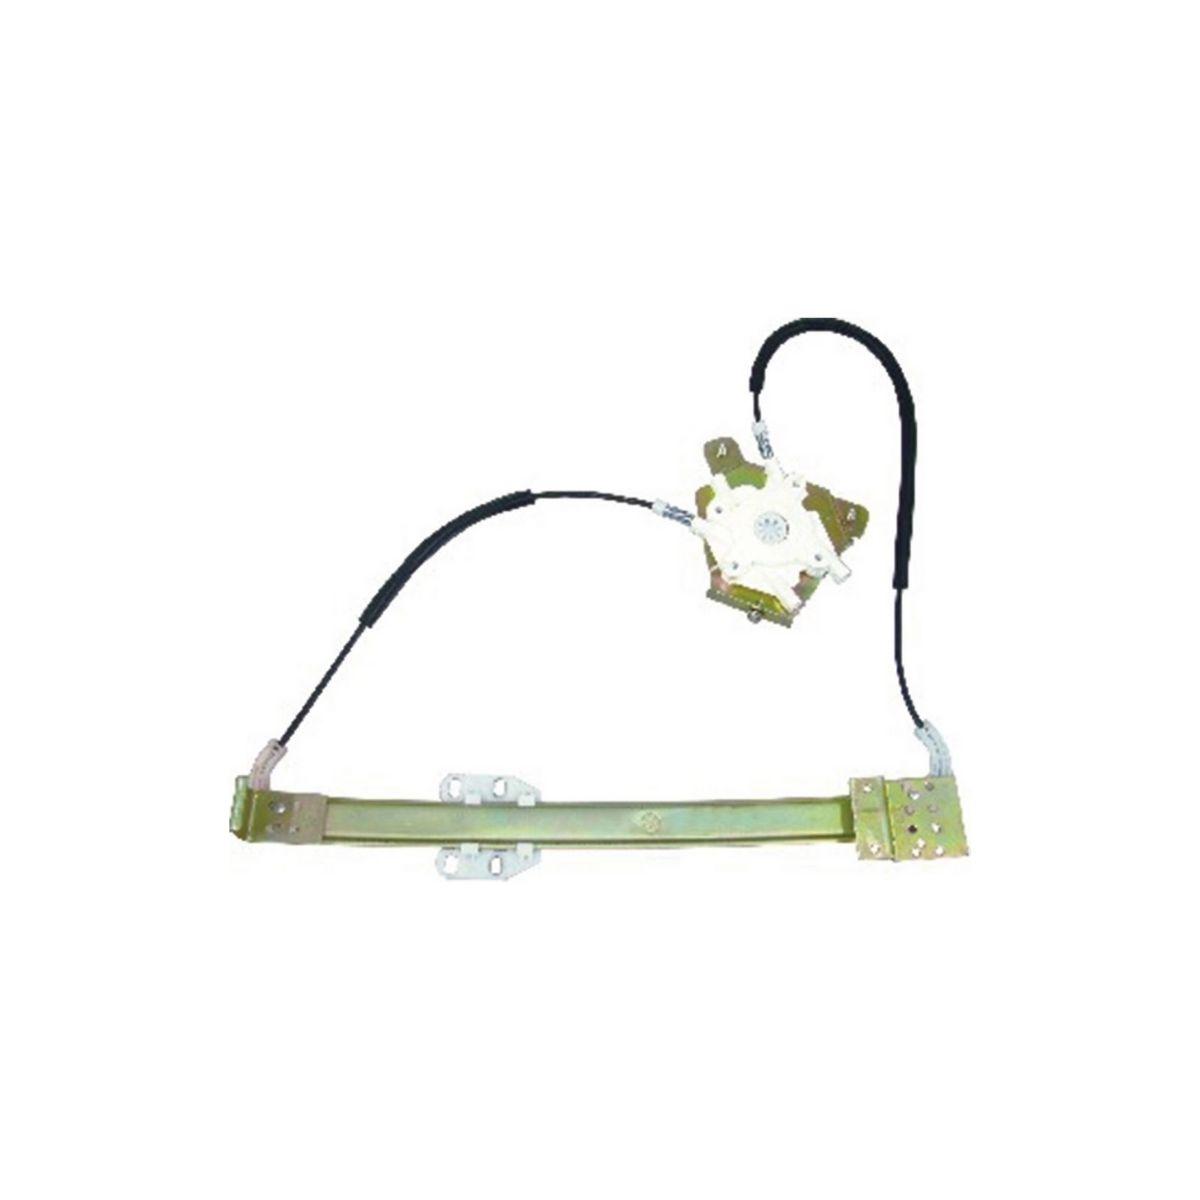 Máquina Vidro Elétrica Dianteira Direita Gol 80/94 Mabuchi